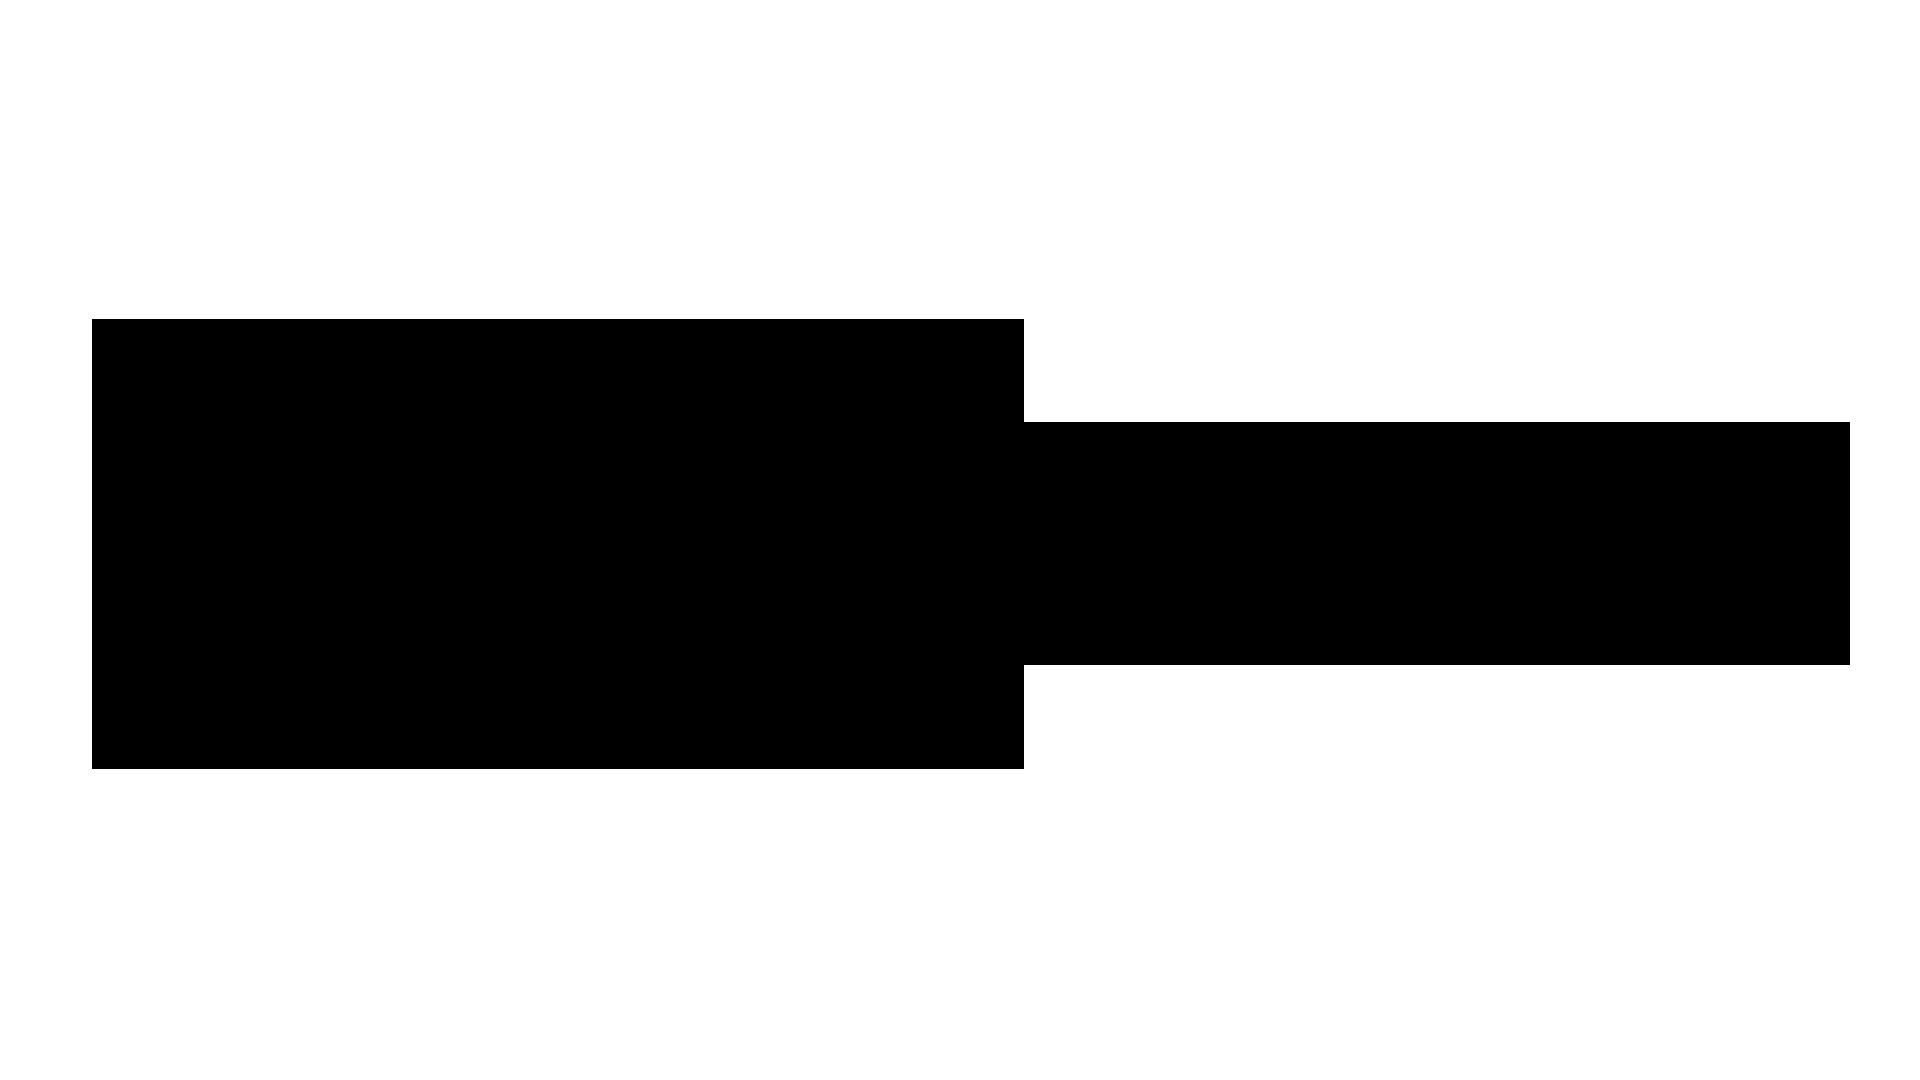 BH logo_1920x1080_black